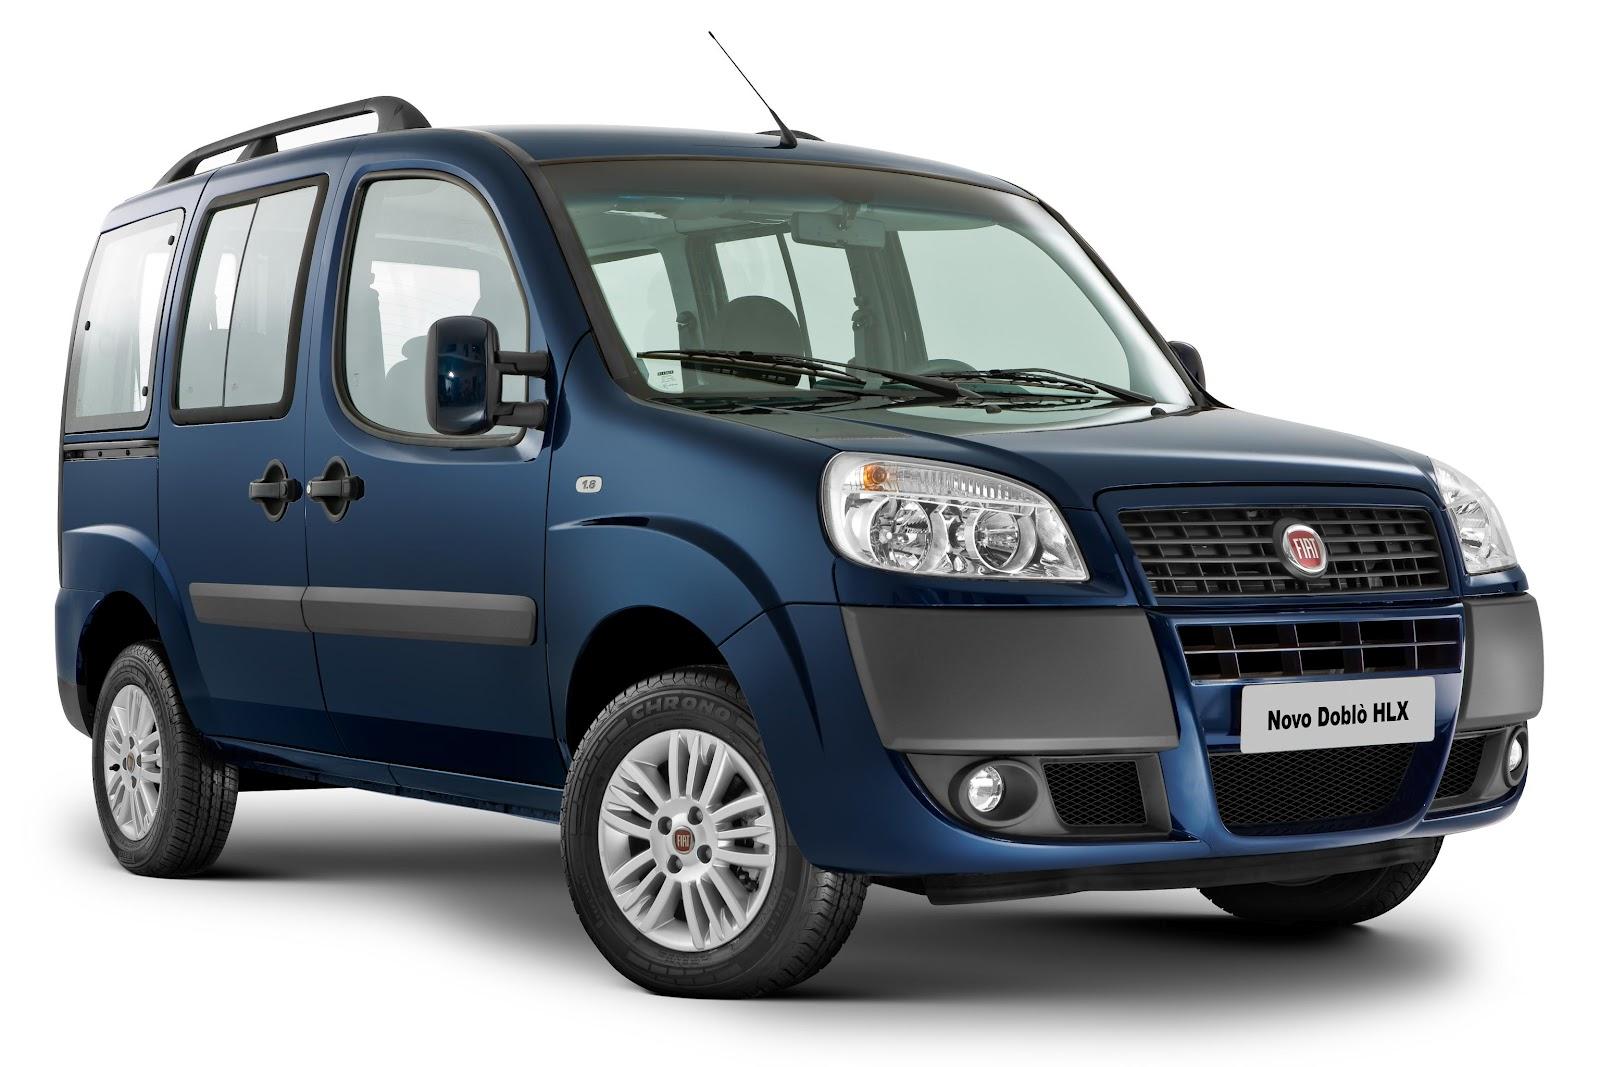 Auto Blog: Fiat Doblò Fotos